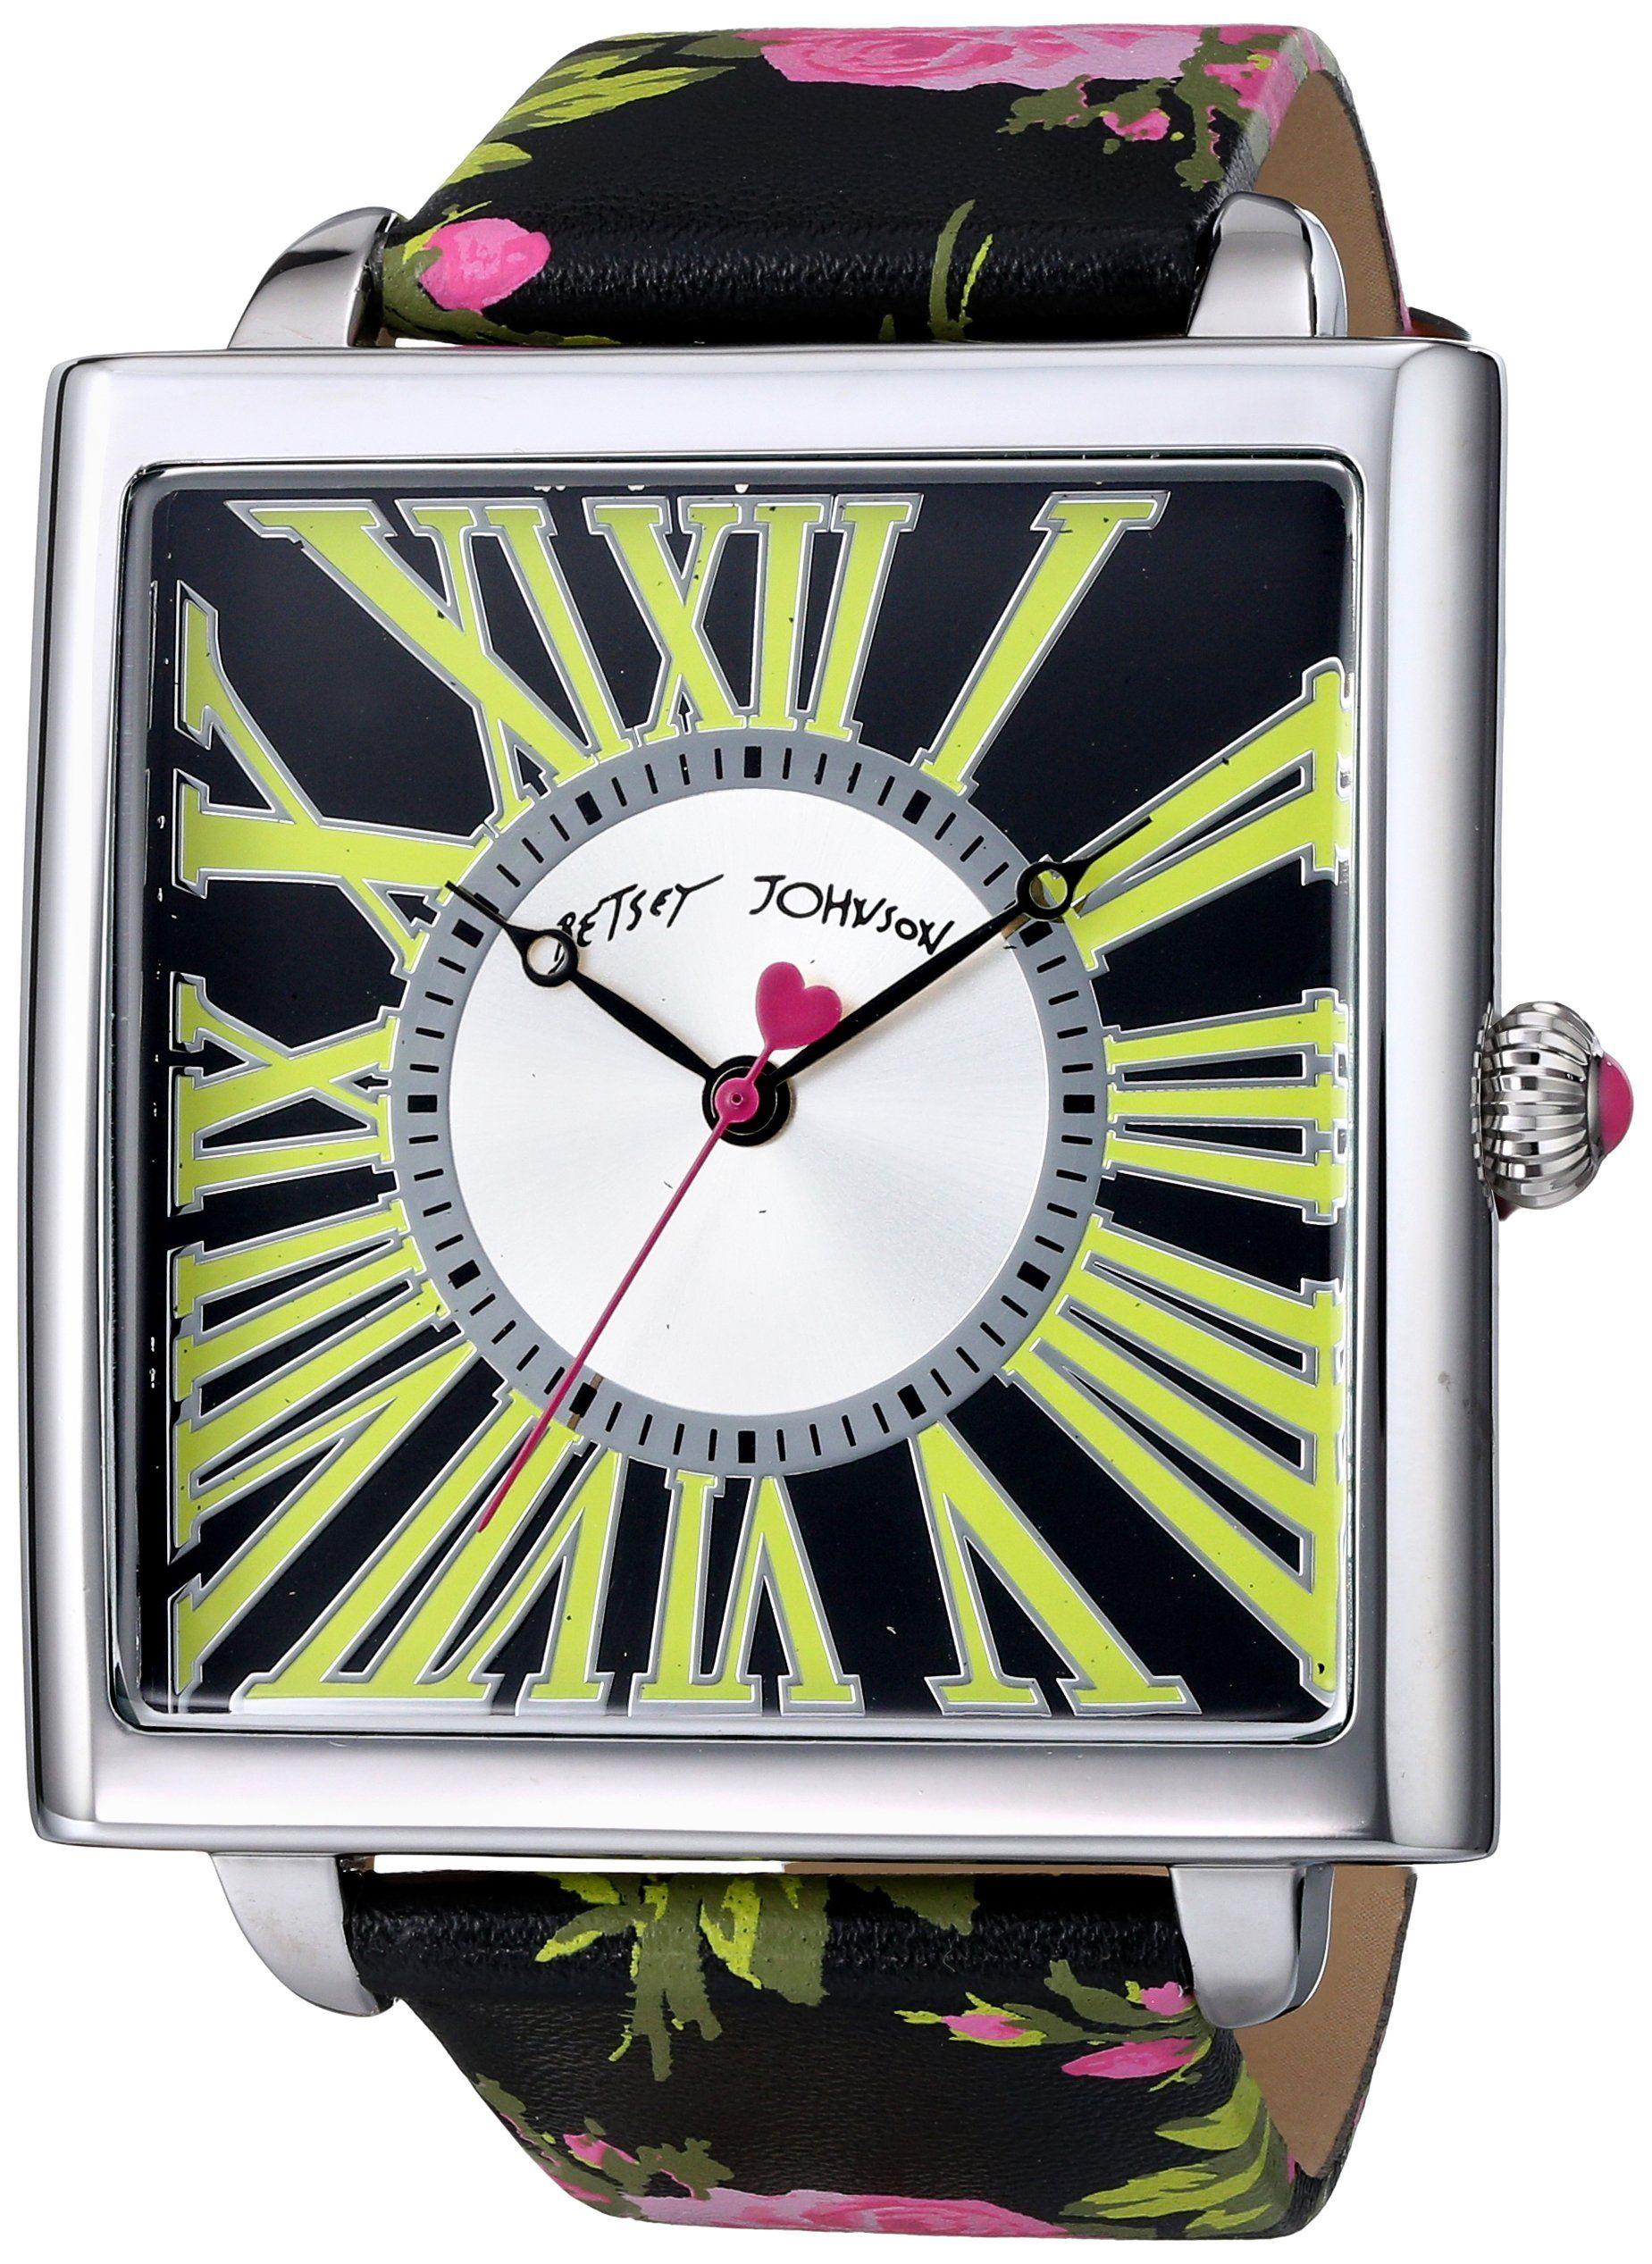 Betsey Johnson Women's BJ00325-02F Analog Display Quartz Multi-Color Watch